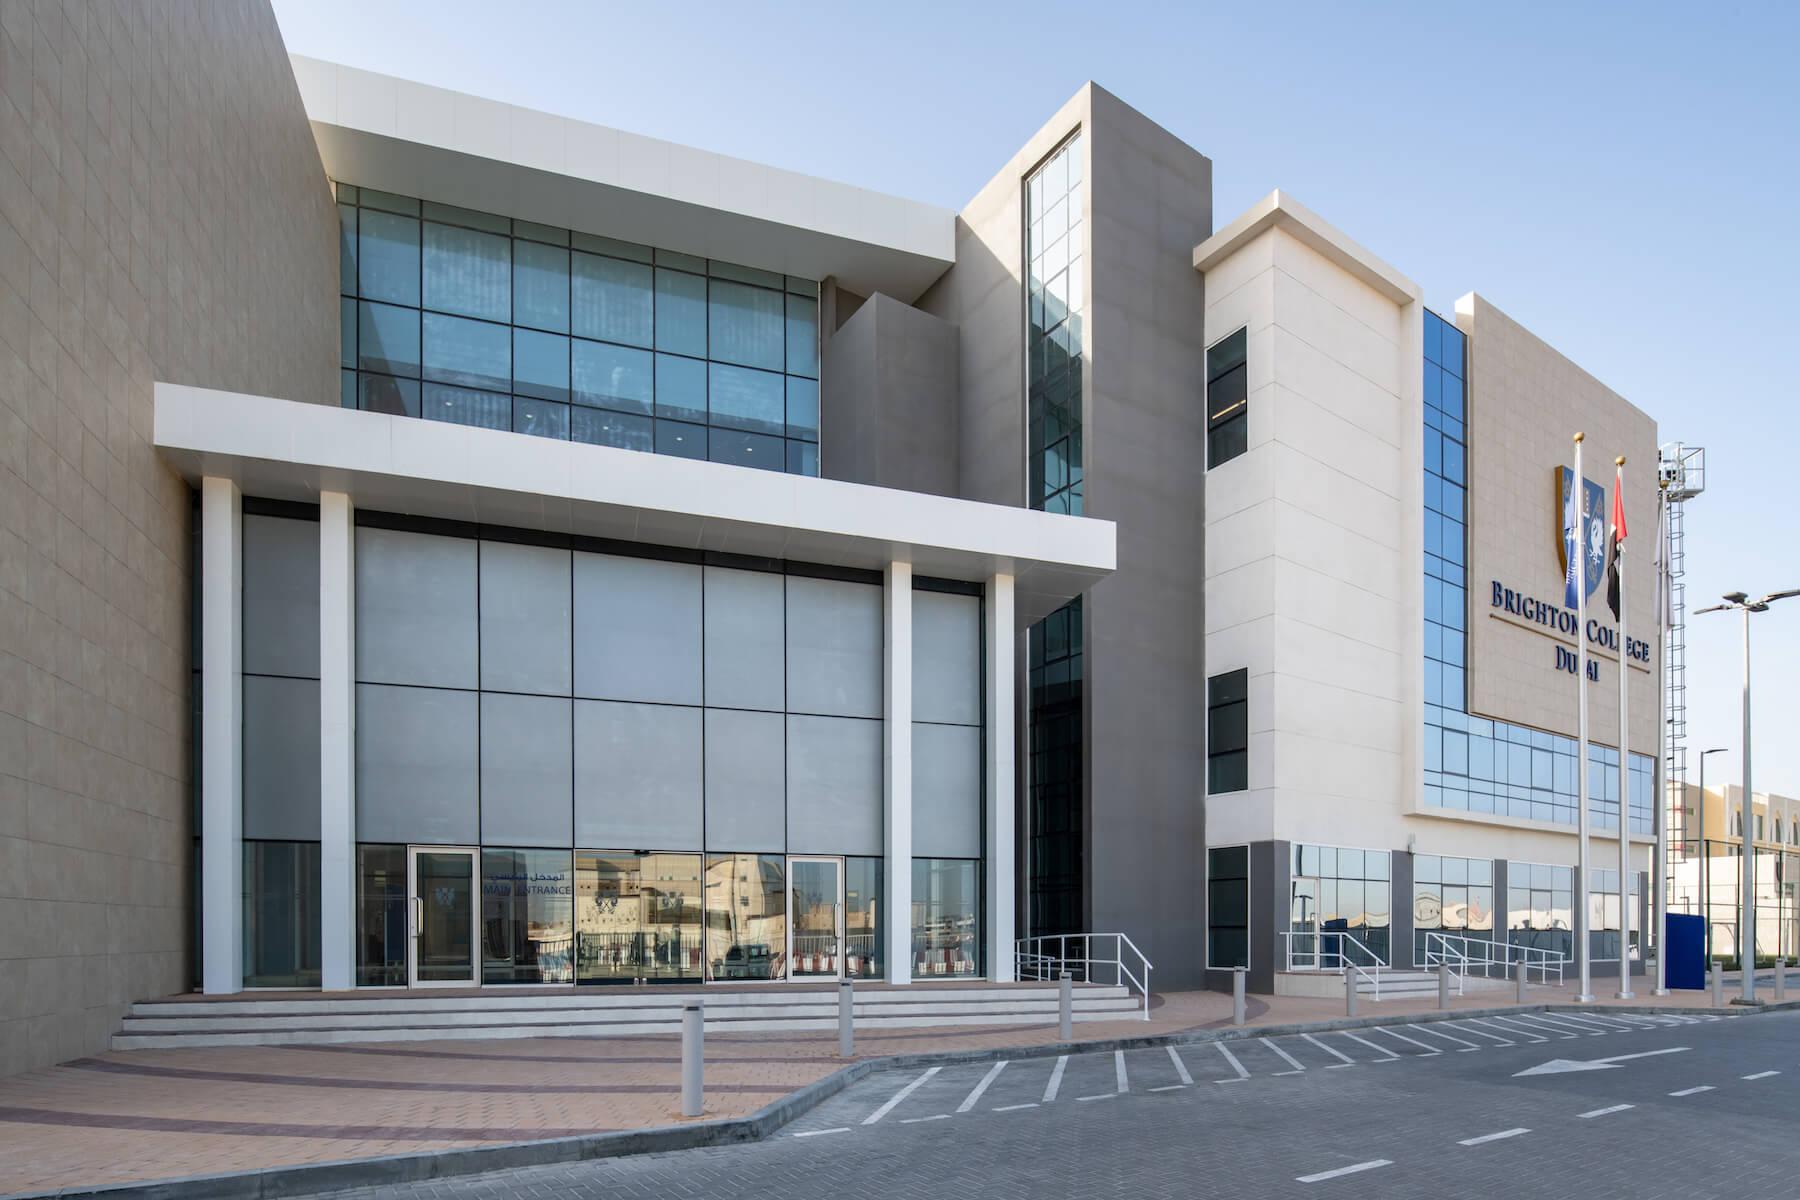 Brighton College Dubai Main Entrance.jpg